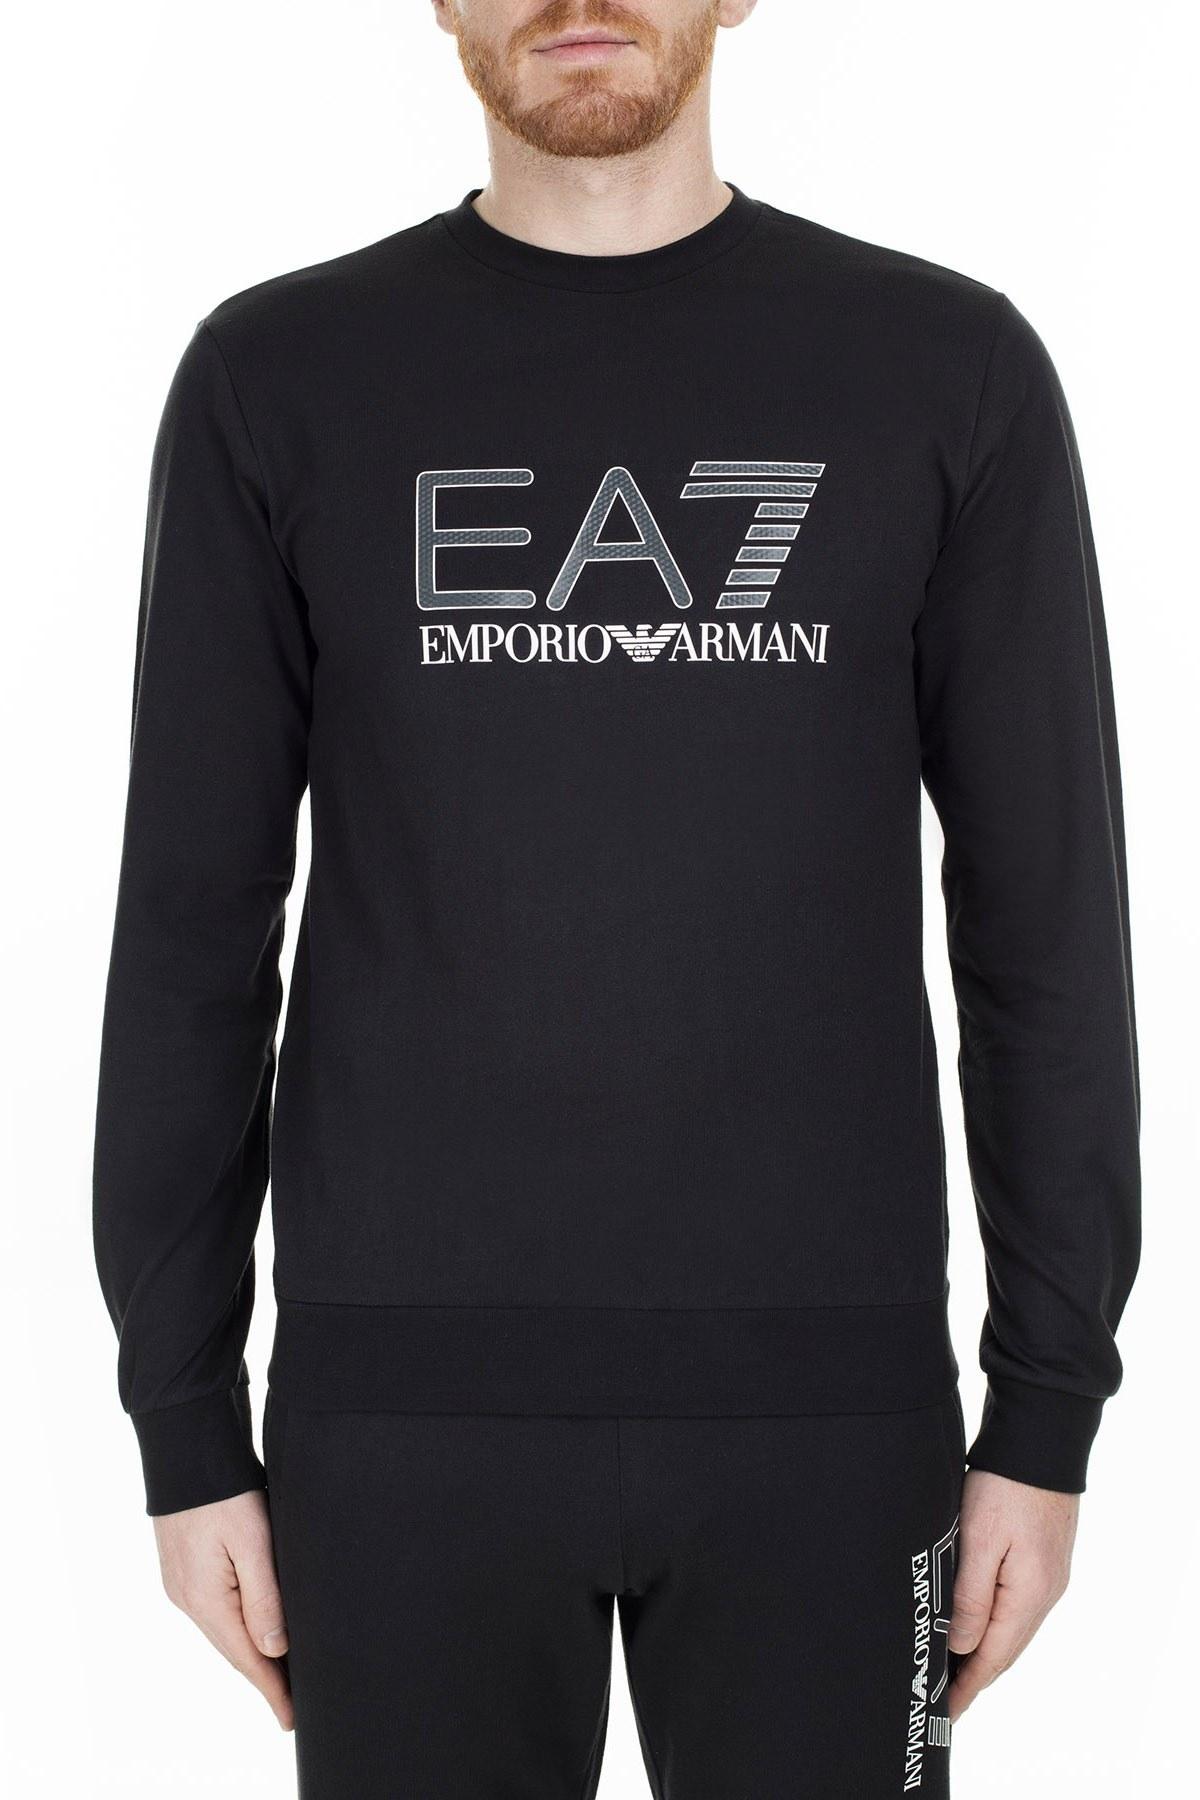 EA7 Erkek Sweat S 3GPM14 PJ05Z 1200 SİYAH